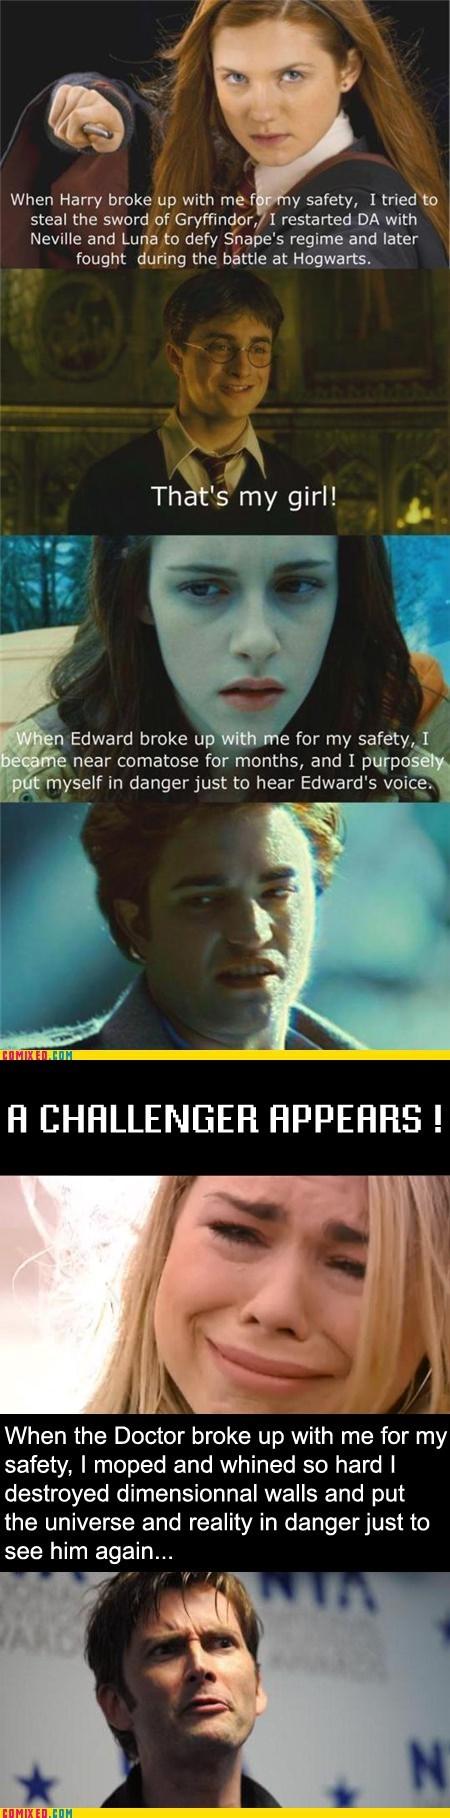 best of week break ups doctor who Harry Potter movies TV twilight - 5491194368